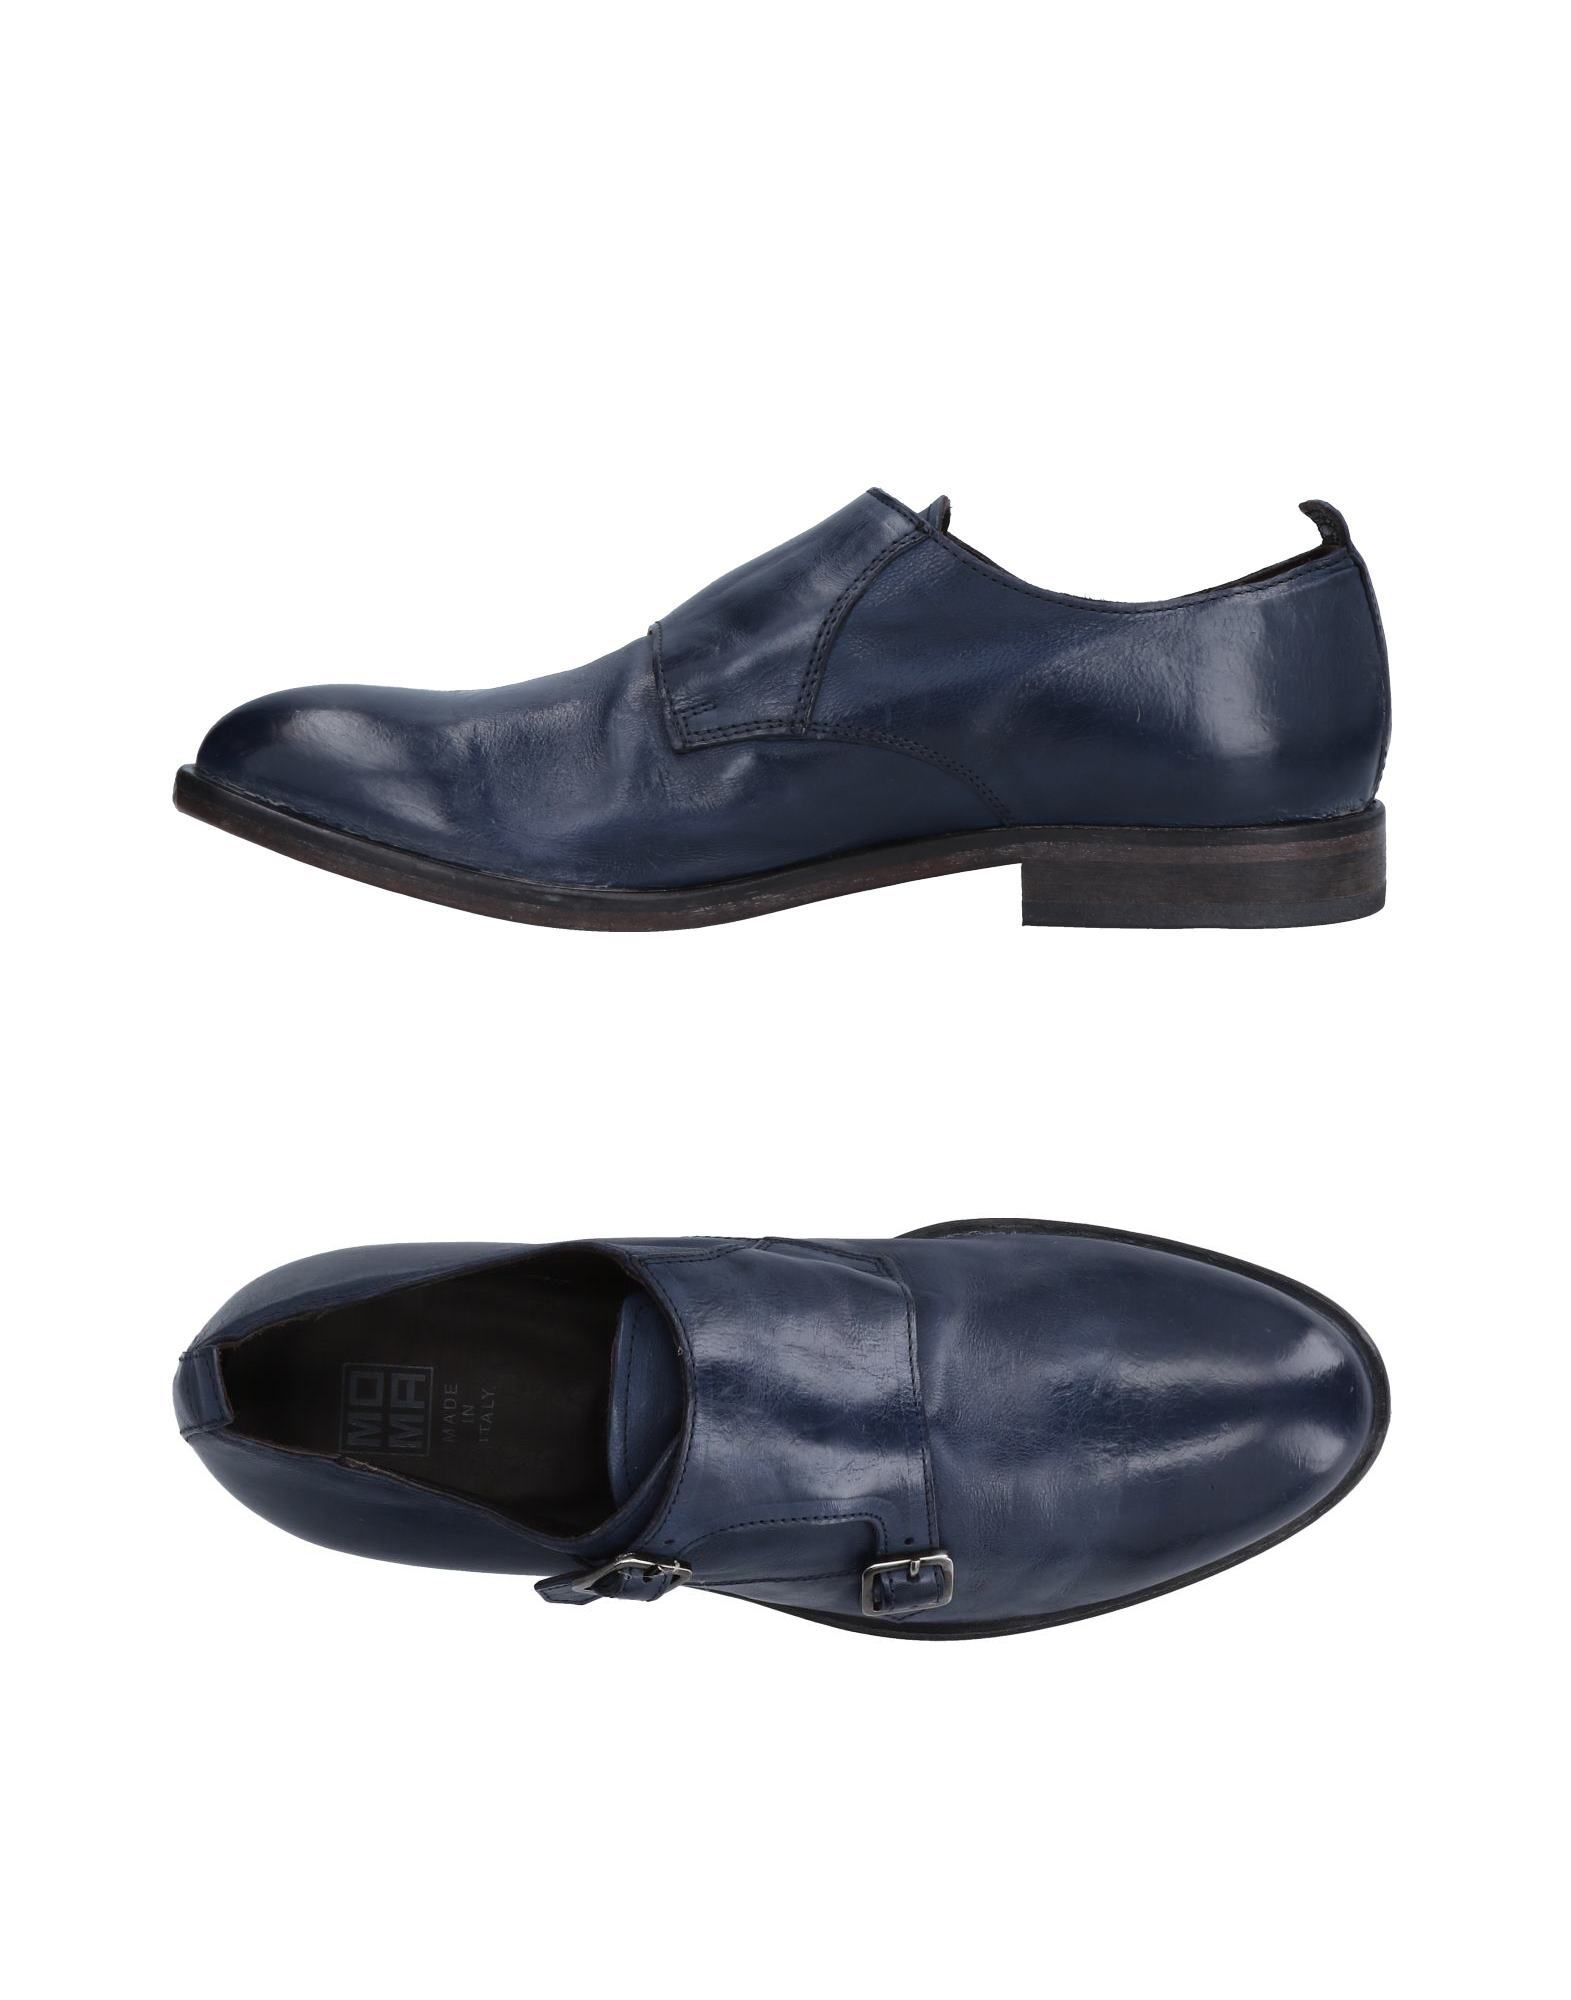 Moma Mokassins Herren  11508709XB Gute Qualität beliebte Schuhe